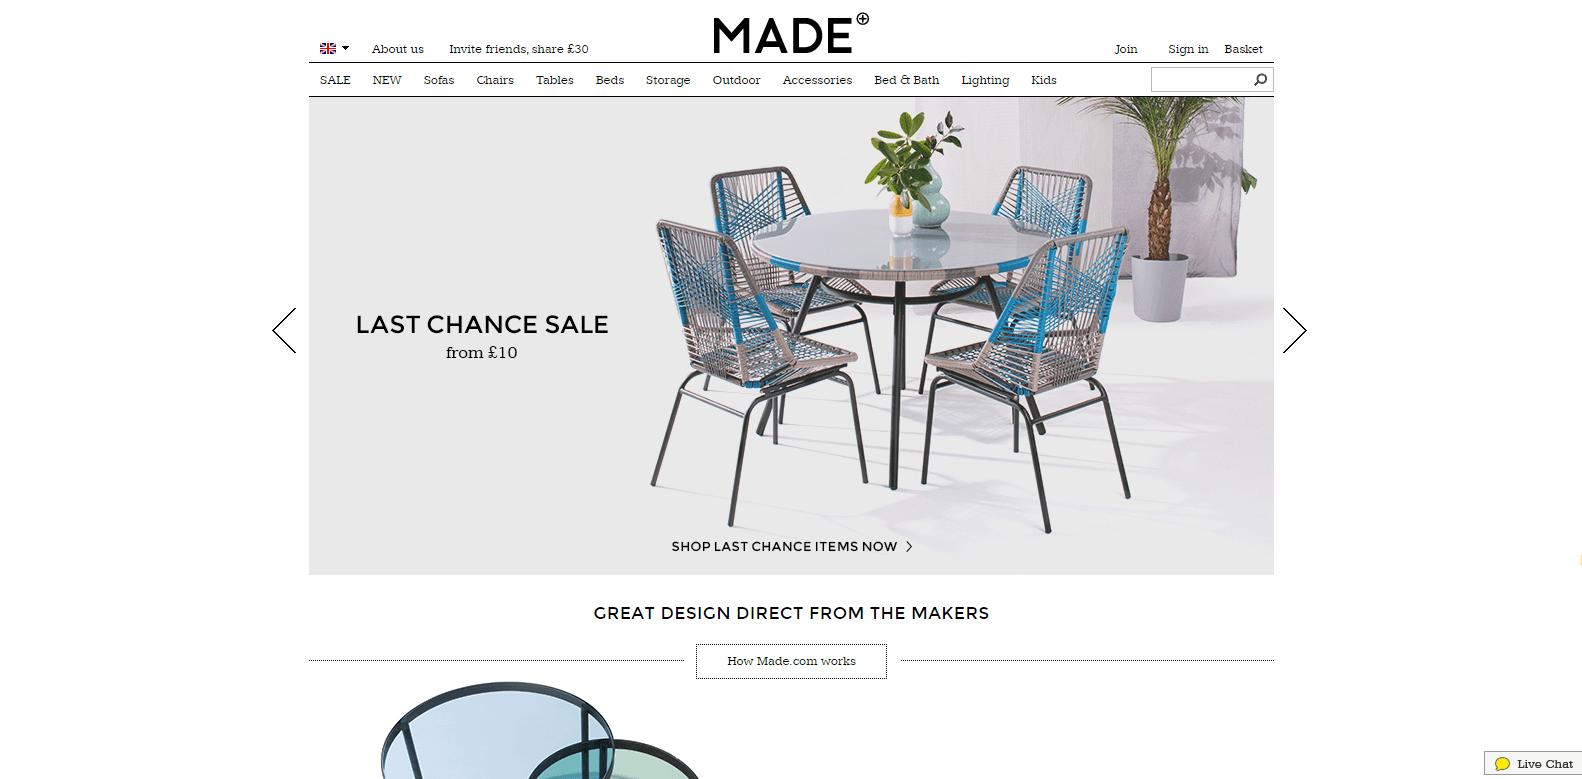 Magento Ecommerce Design - Made